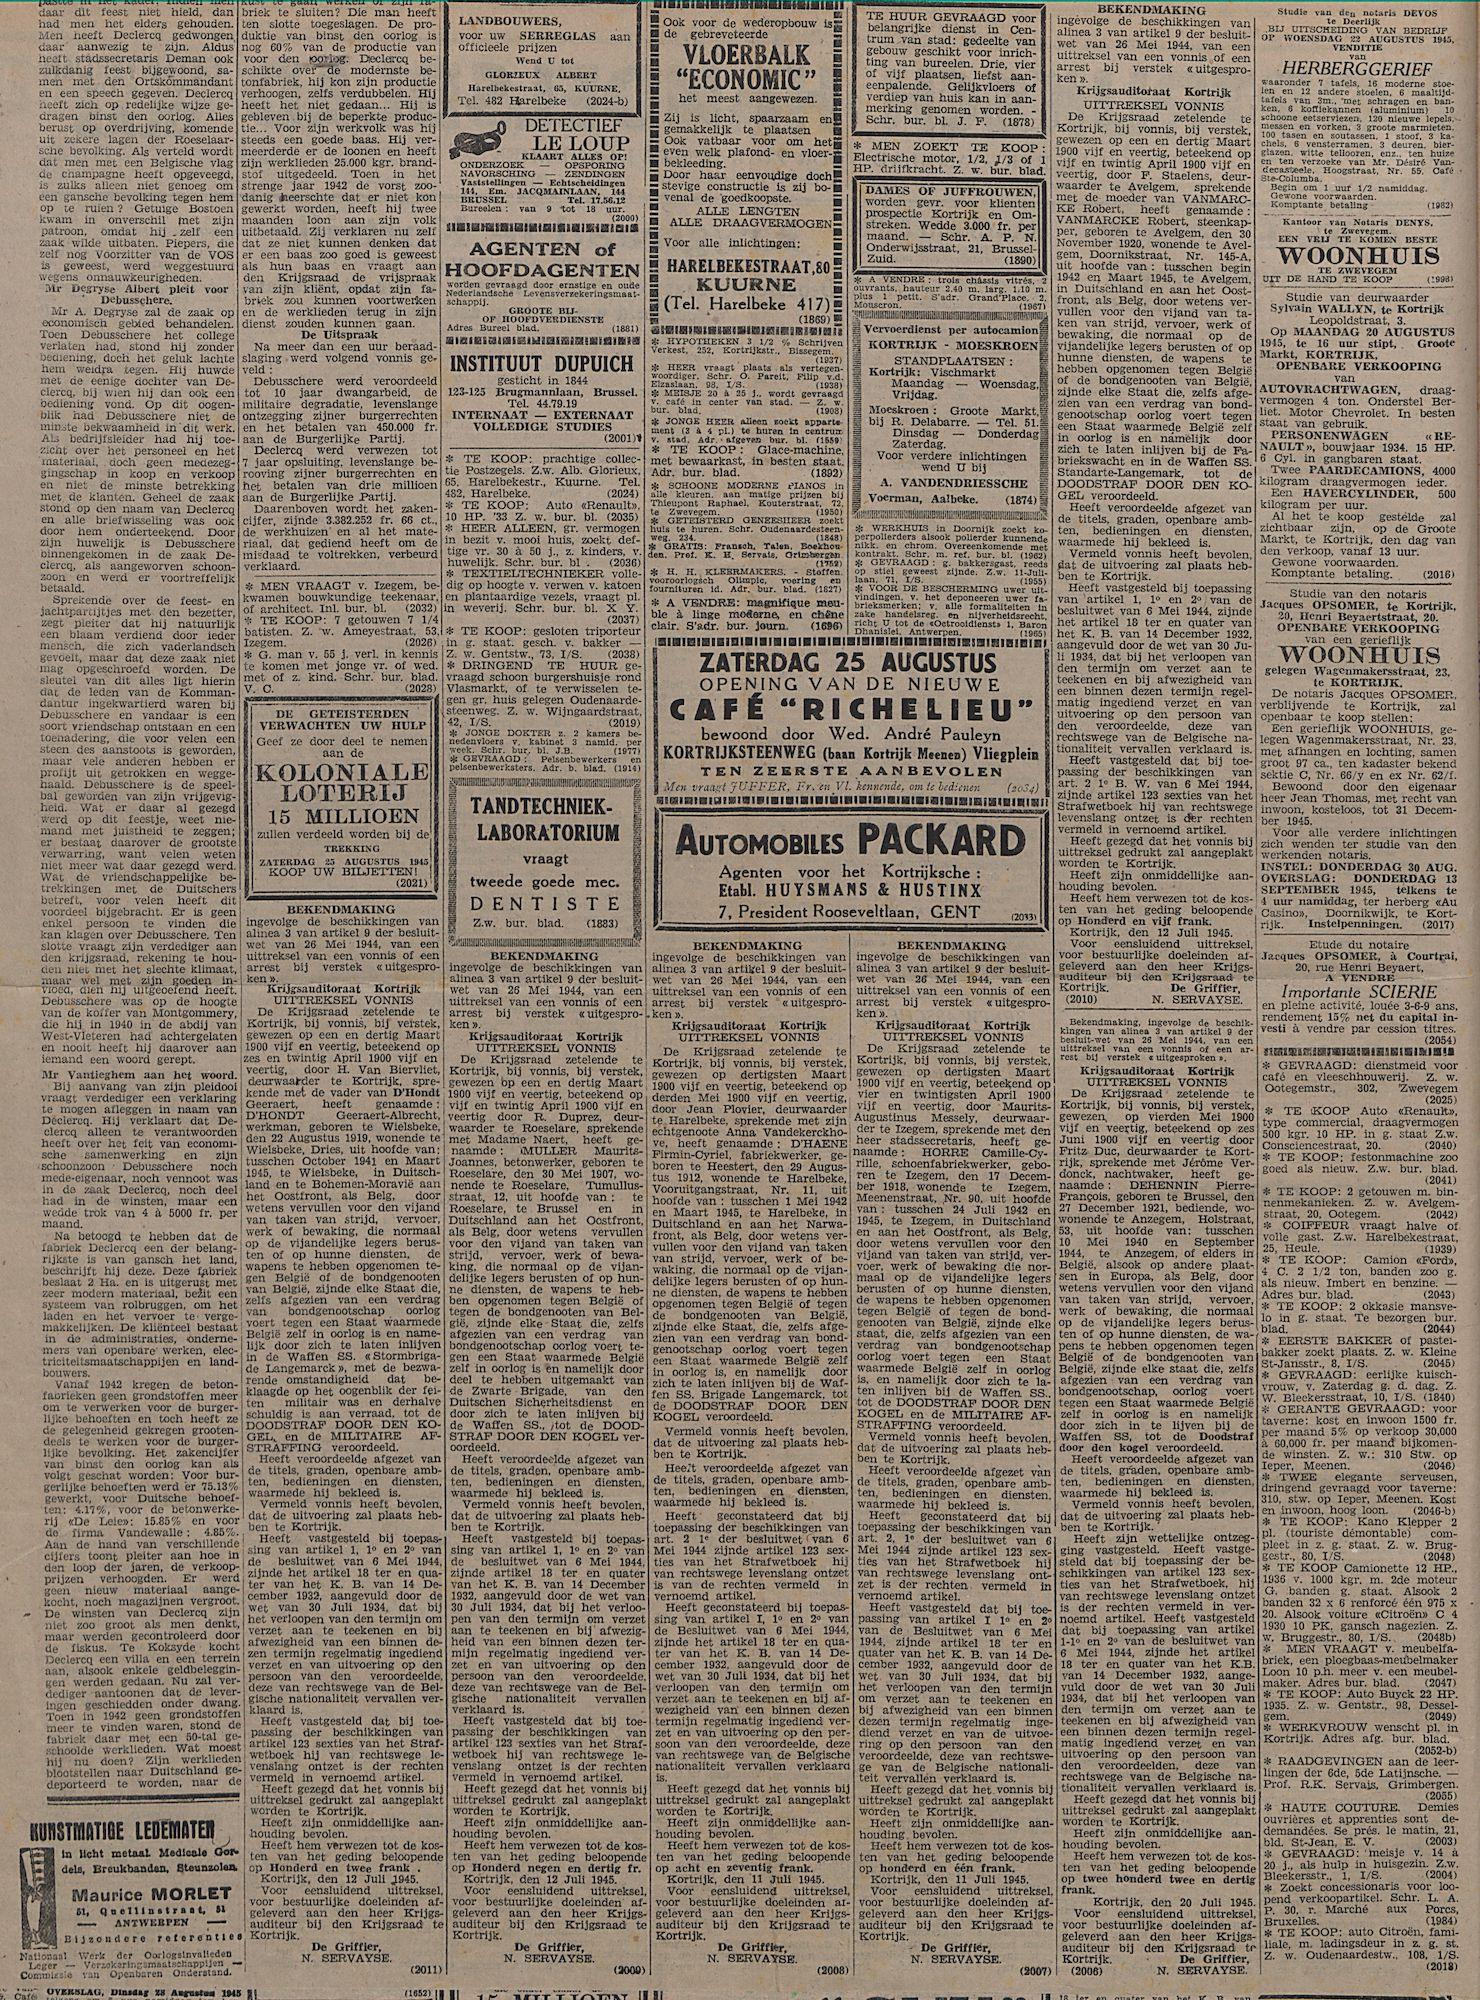 Kortrijksch Handelsblad 15 augustus 1945 Nr65 p2